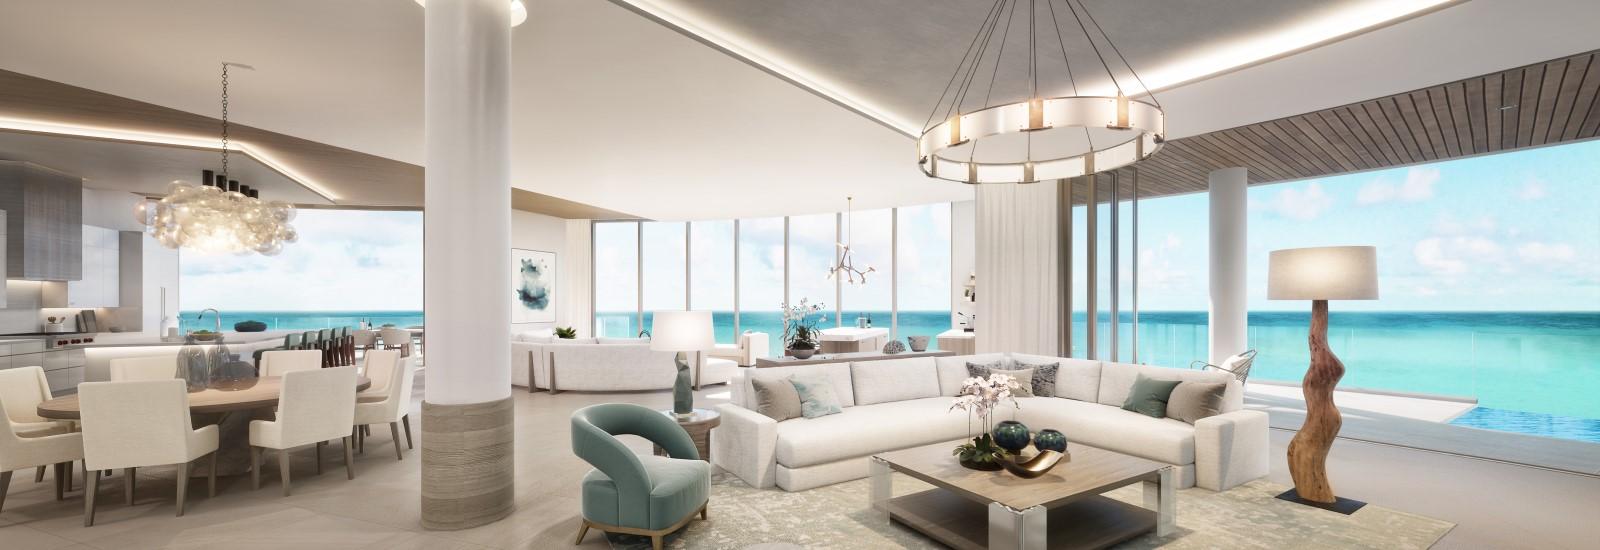 1-the-residences-at-the-st-regis-longboat-key-interior.jpg